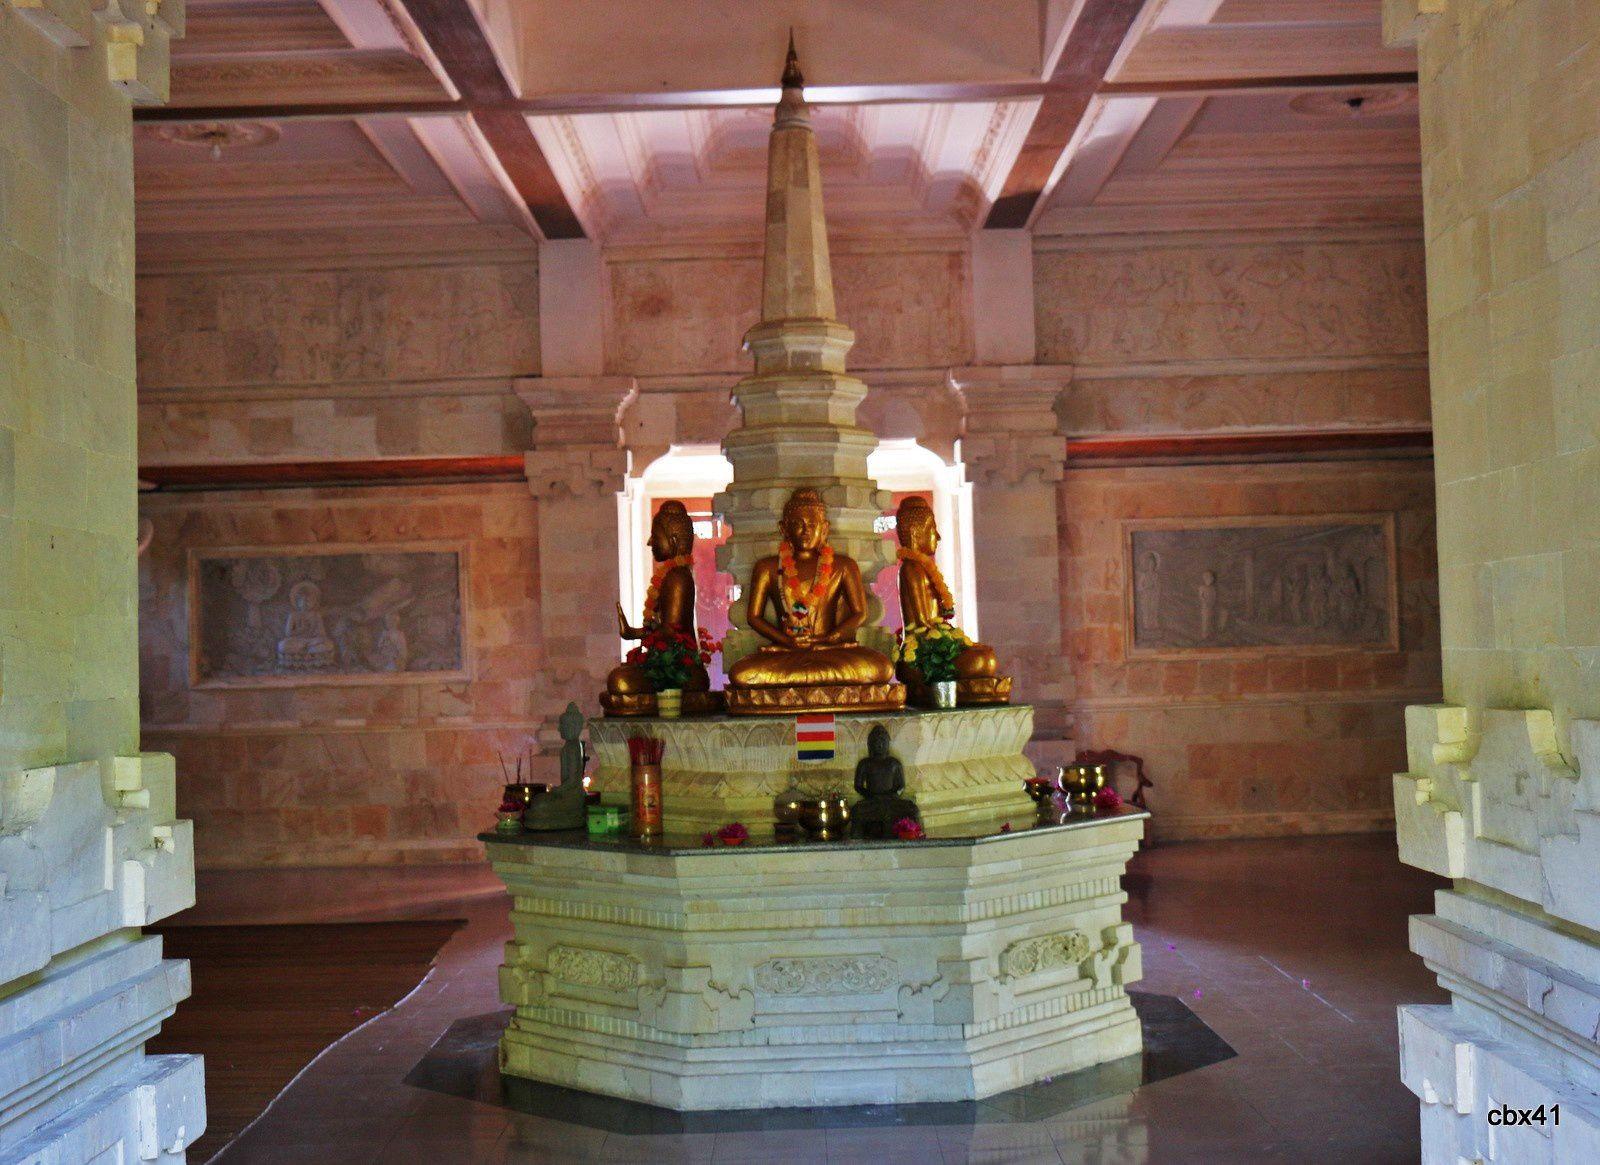 Monastère Brahma Vihara Arama (Bali), maison de Bouddha